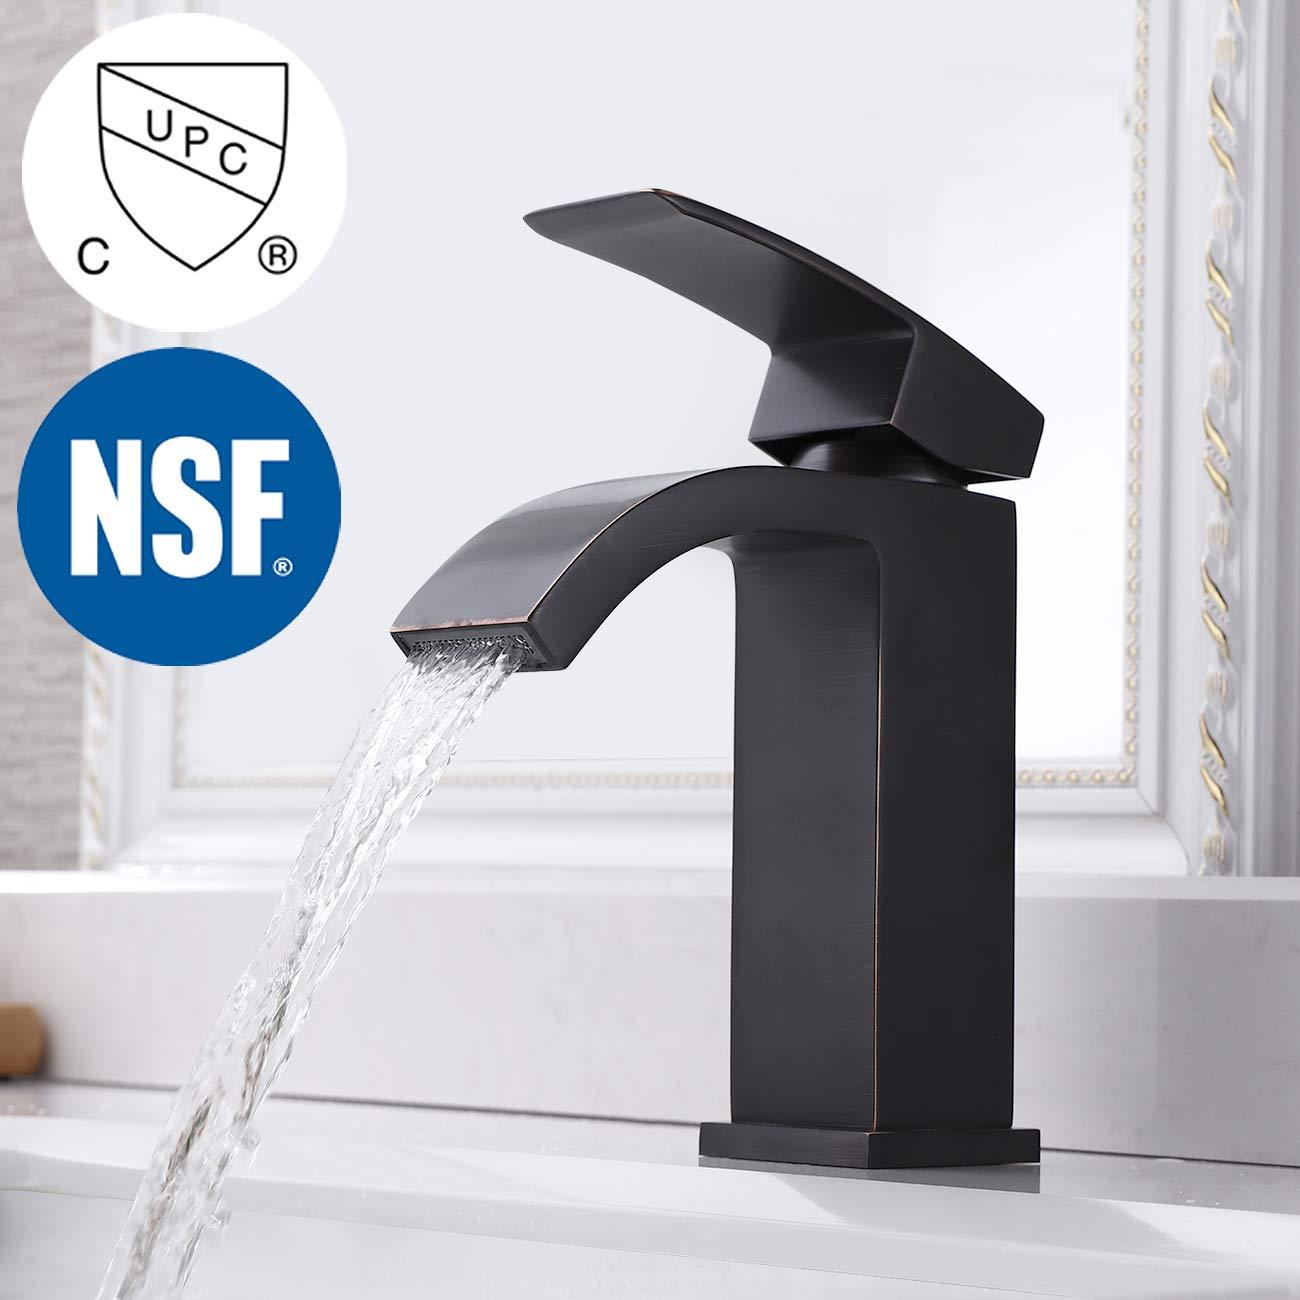 KES NSF Bathroom Waterfall Faucet Single Handle One Hole LavatoryBasin Vanity Sink Lead Free Brass cUPC Faucet Oil Rubbed Bronze, L3109ALF-ORB